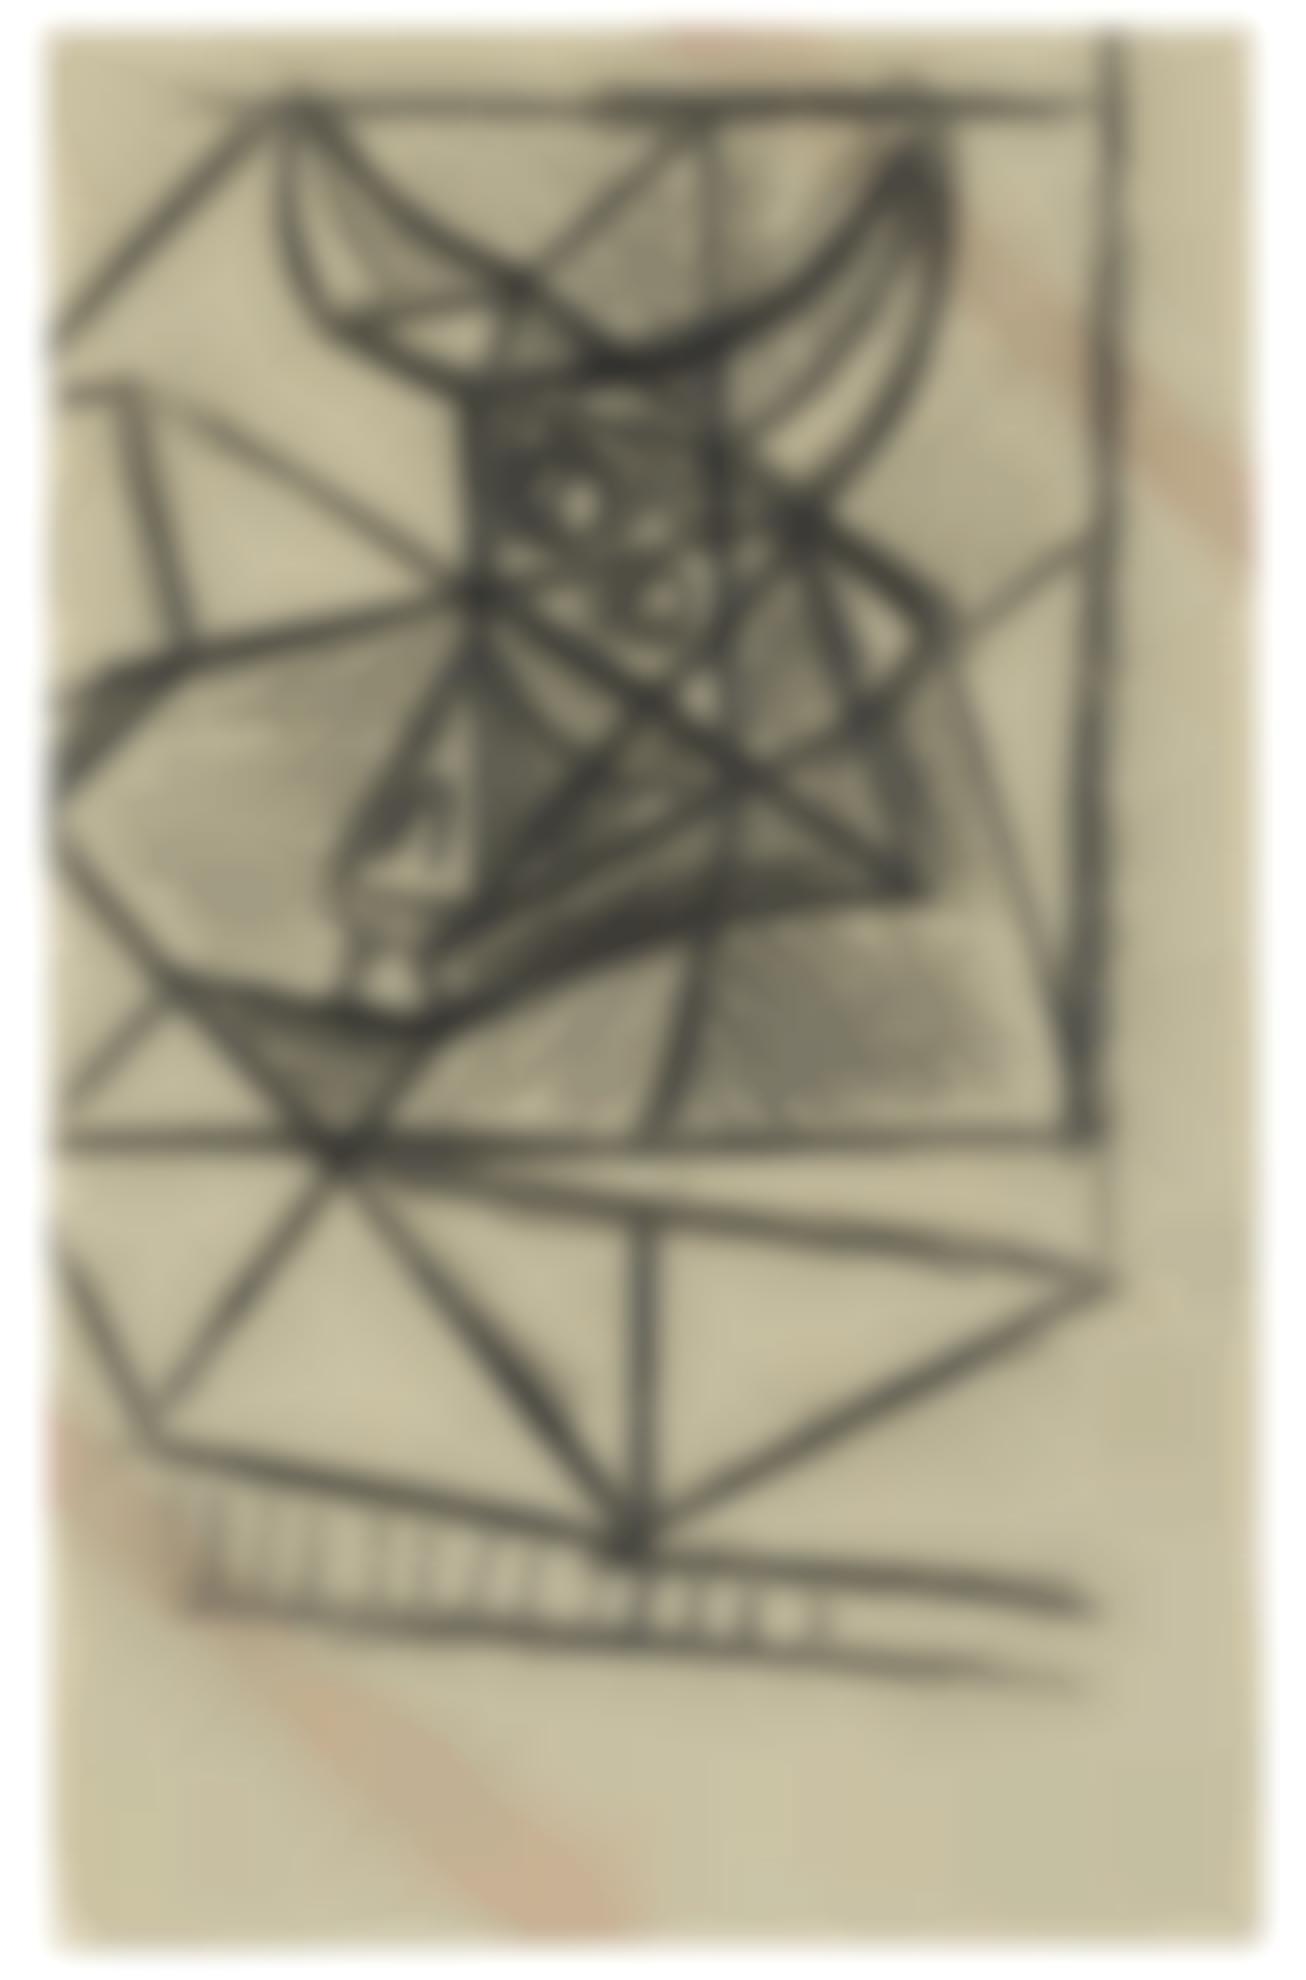 Pablo Picasso-Taureau-1942